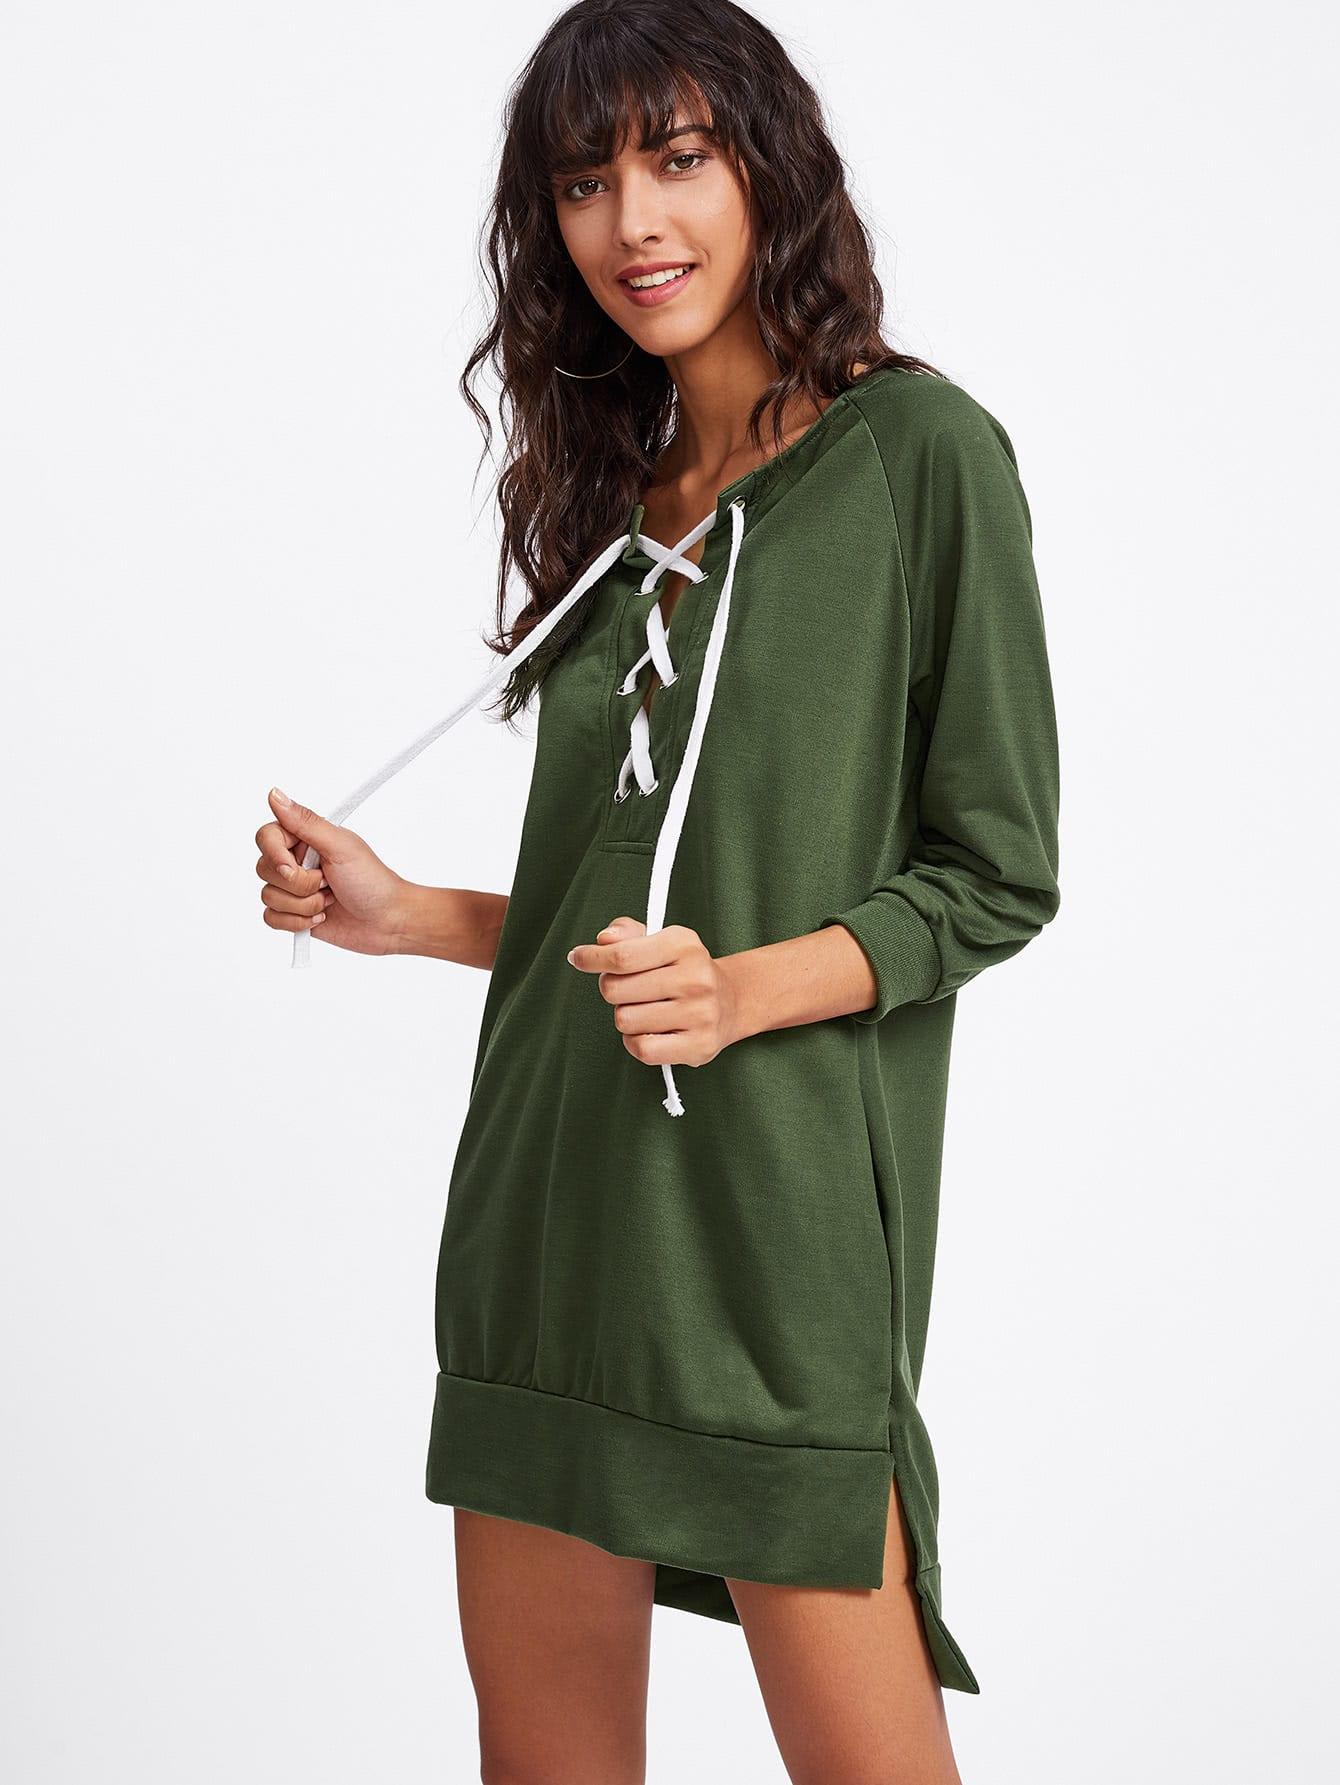 Grommet Lace Up Slit Side Raglan Sweatshirt Dress grommet lace up slit back pencil skirt